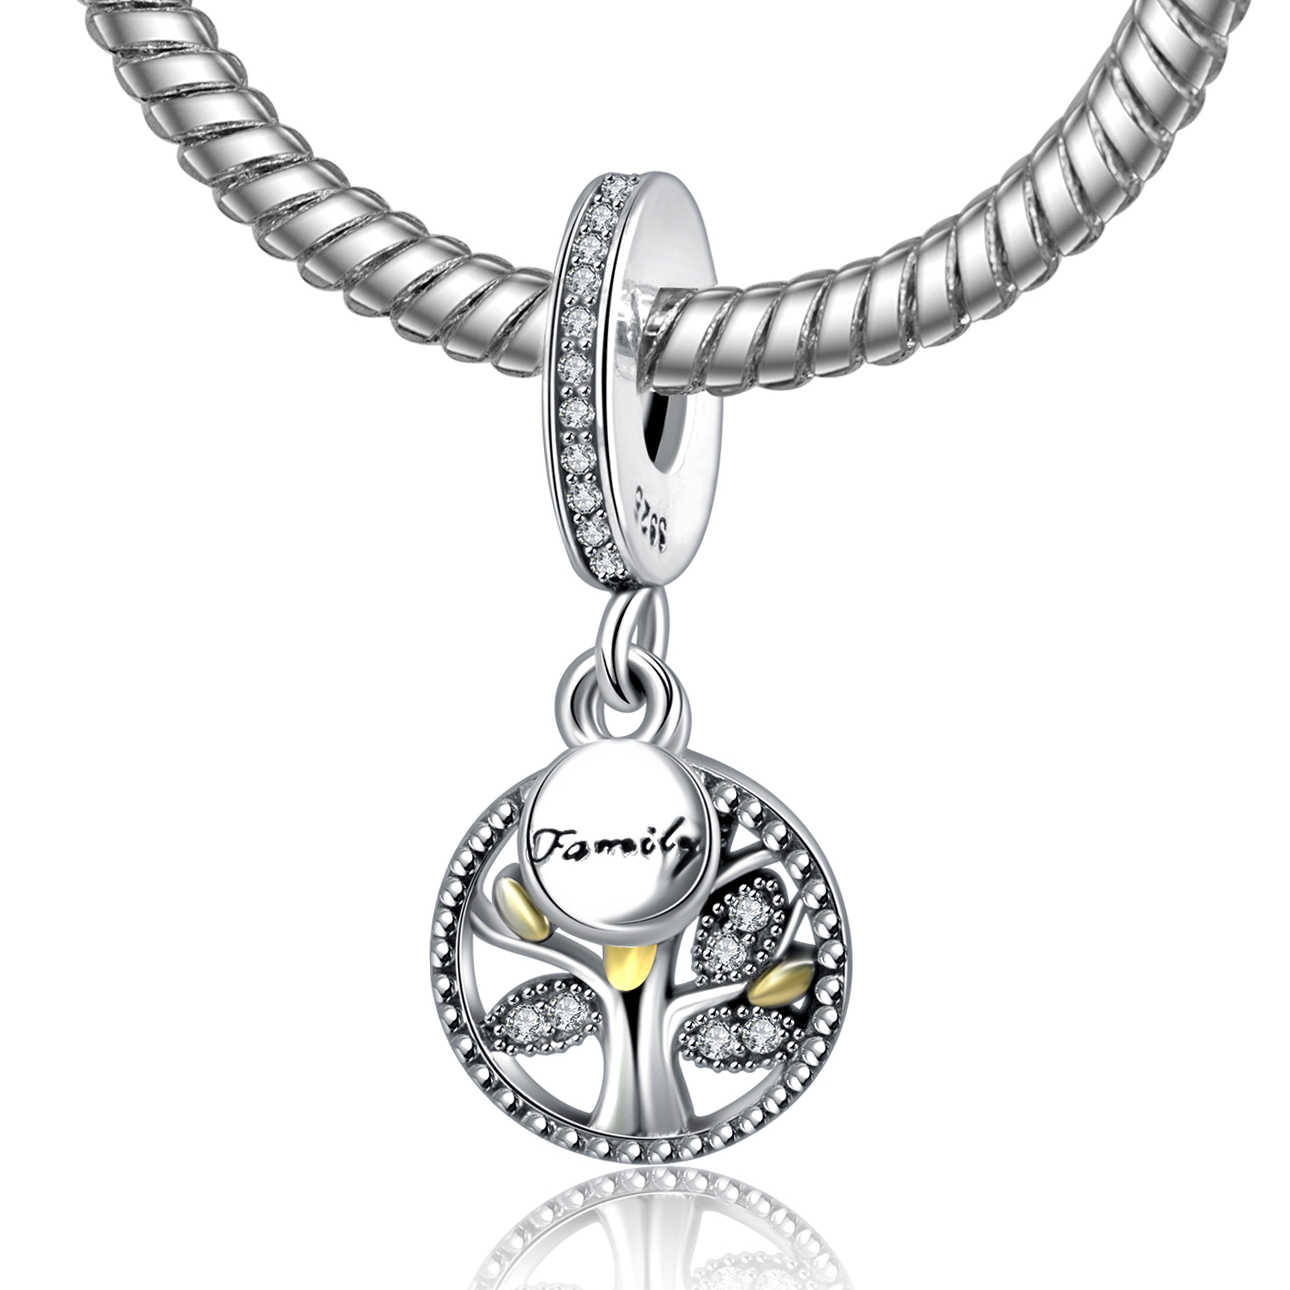 5d4ef1eb3 2018 Authentic 925 Sterling Silver Family Tree Charm Beads Fit Original  Pandora Bracelet Luxury DIY Making